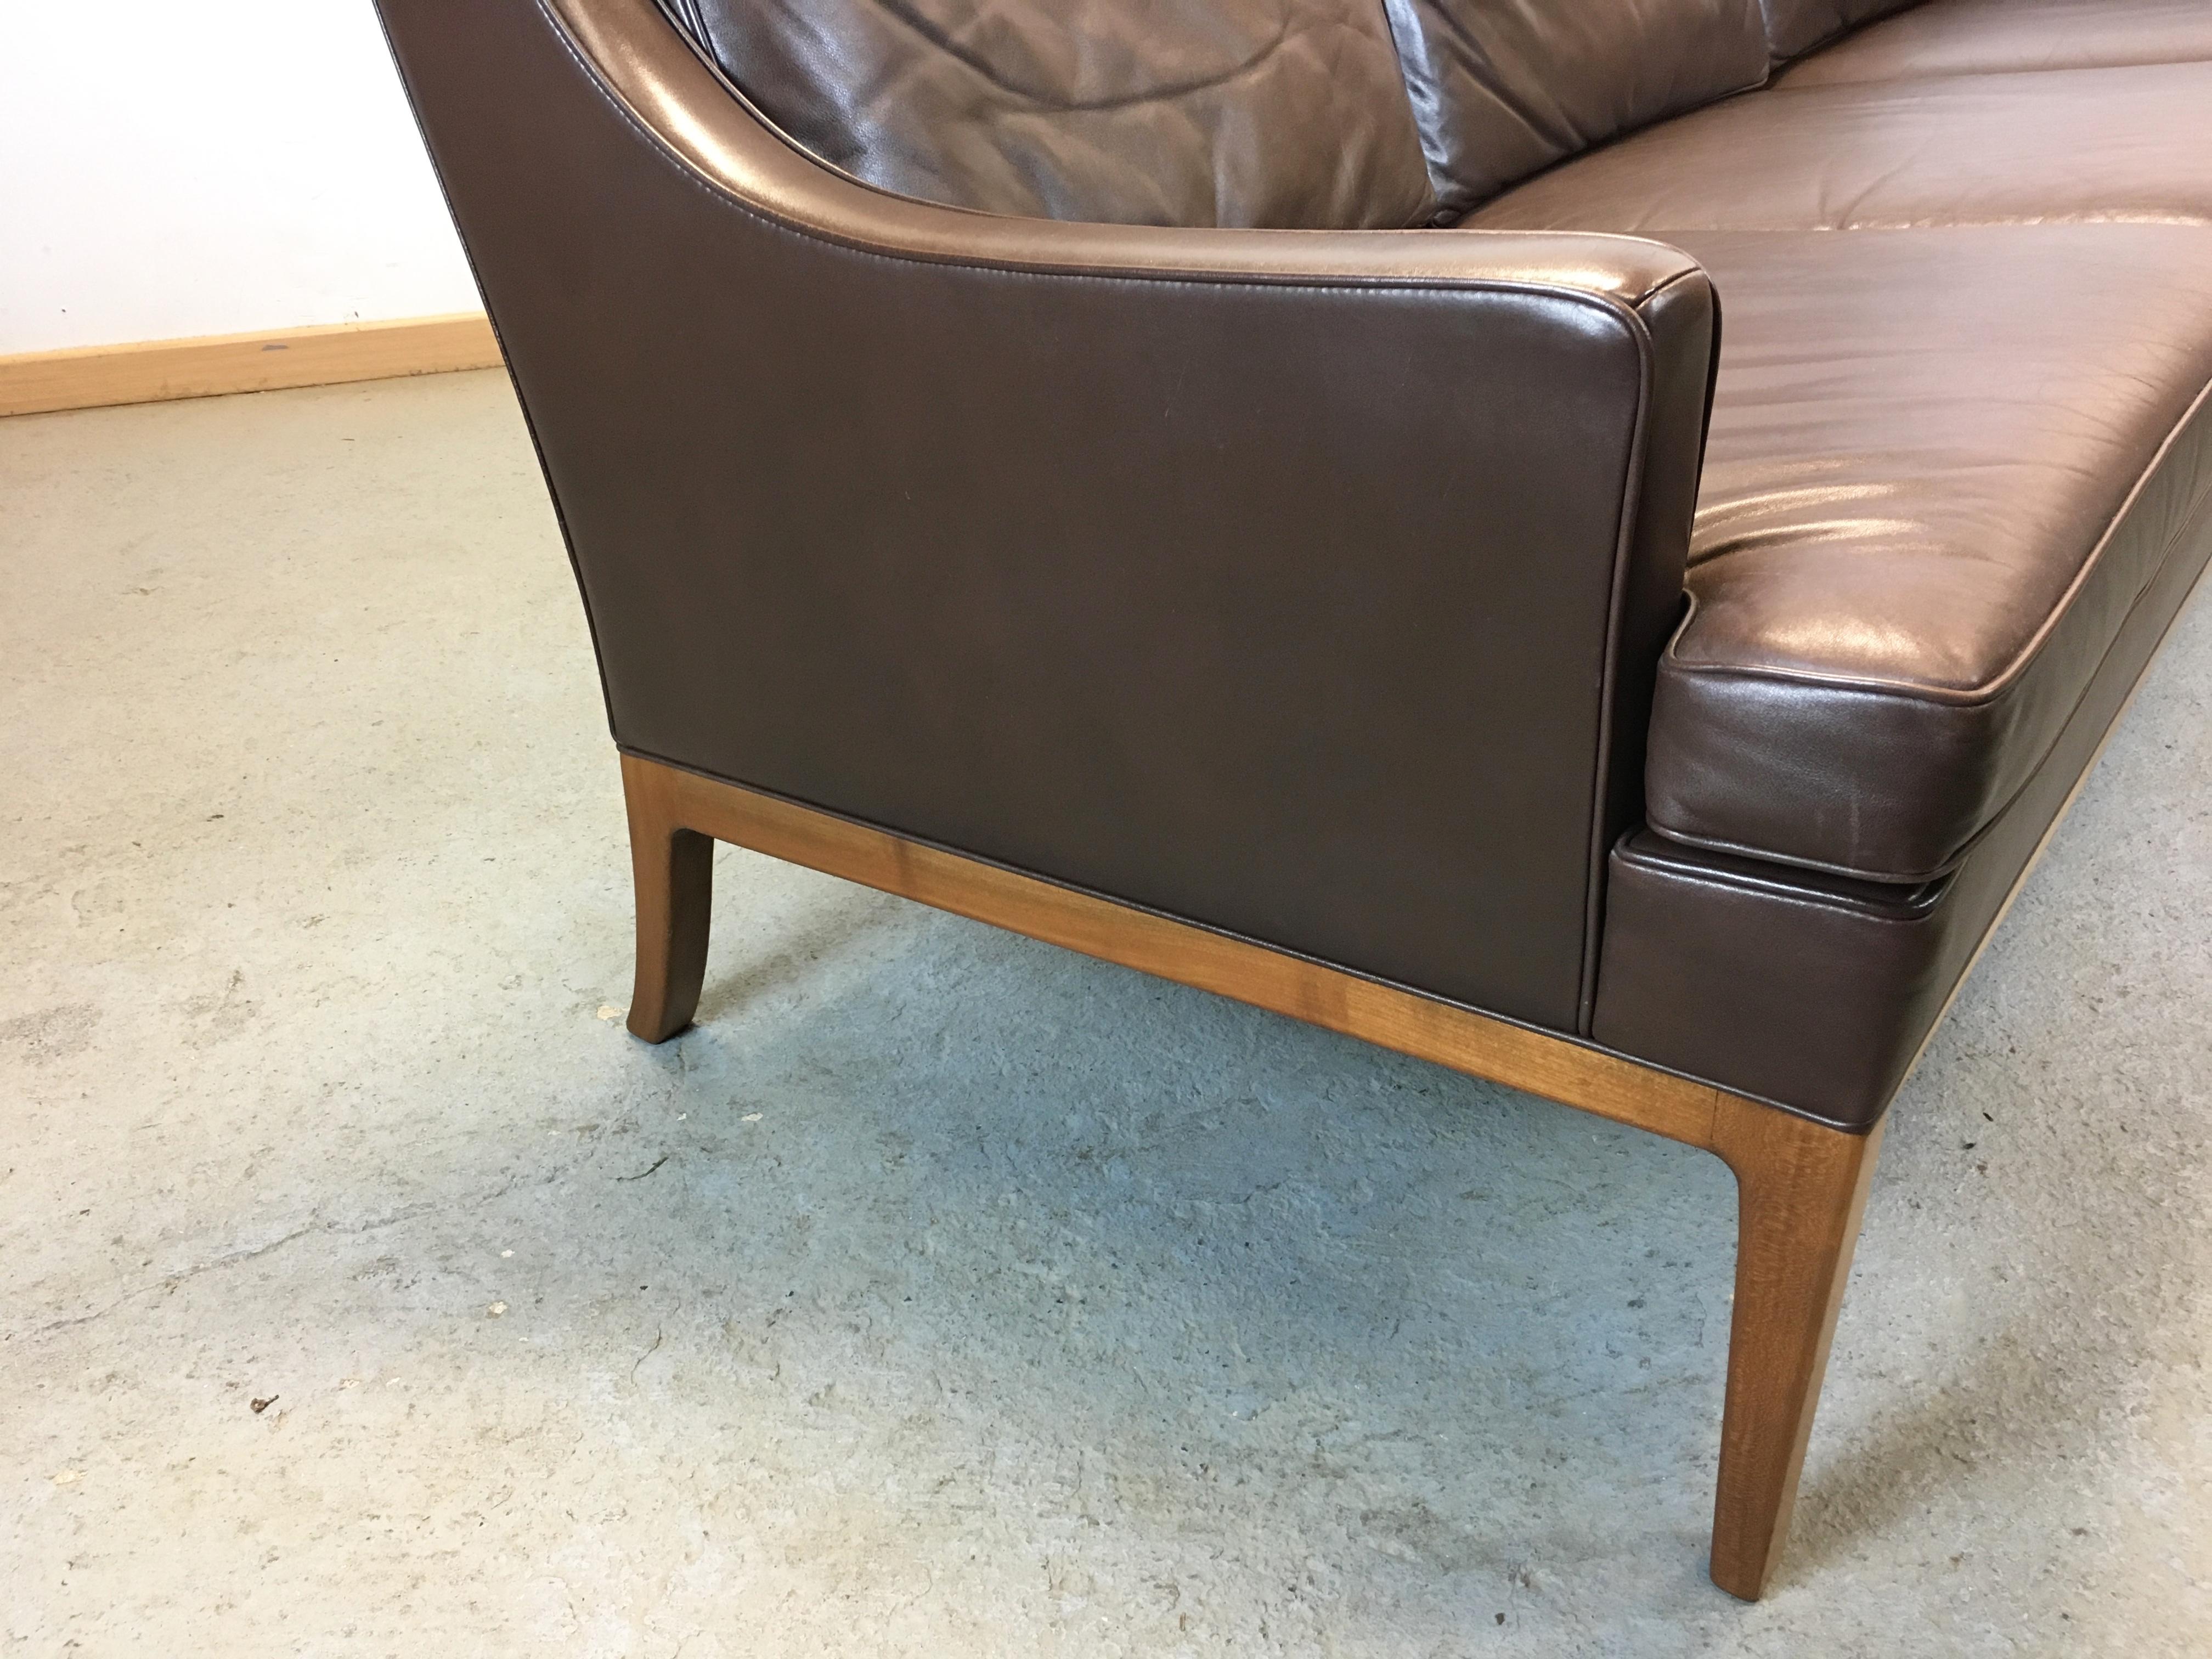 canap cuir ann e 60 leather sofa by rudolf b glatzel for kill international. Black Bedroom Furniture Sets. Home Design Ideas